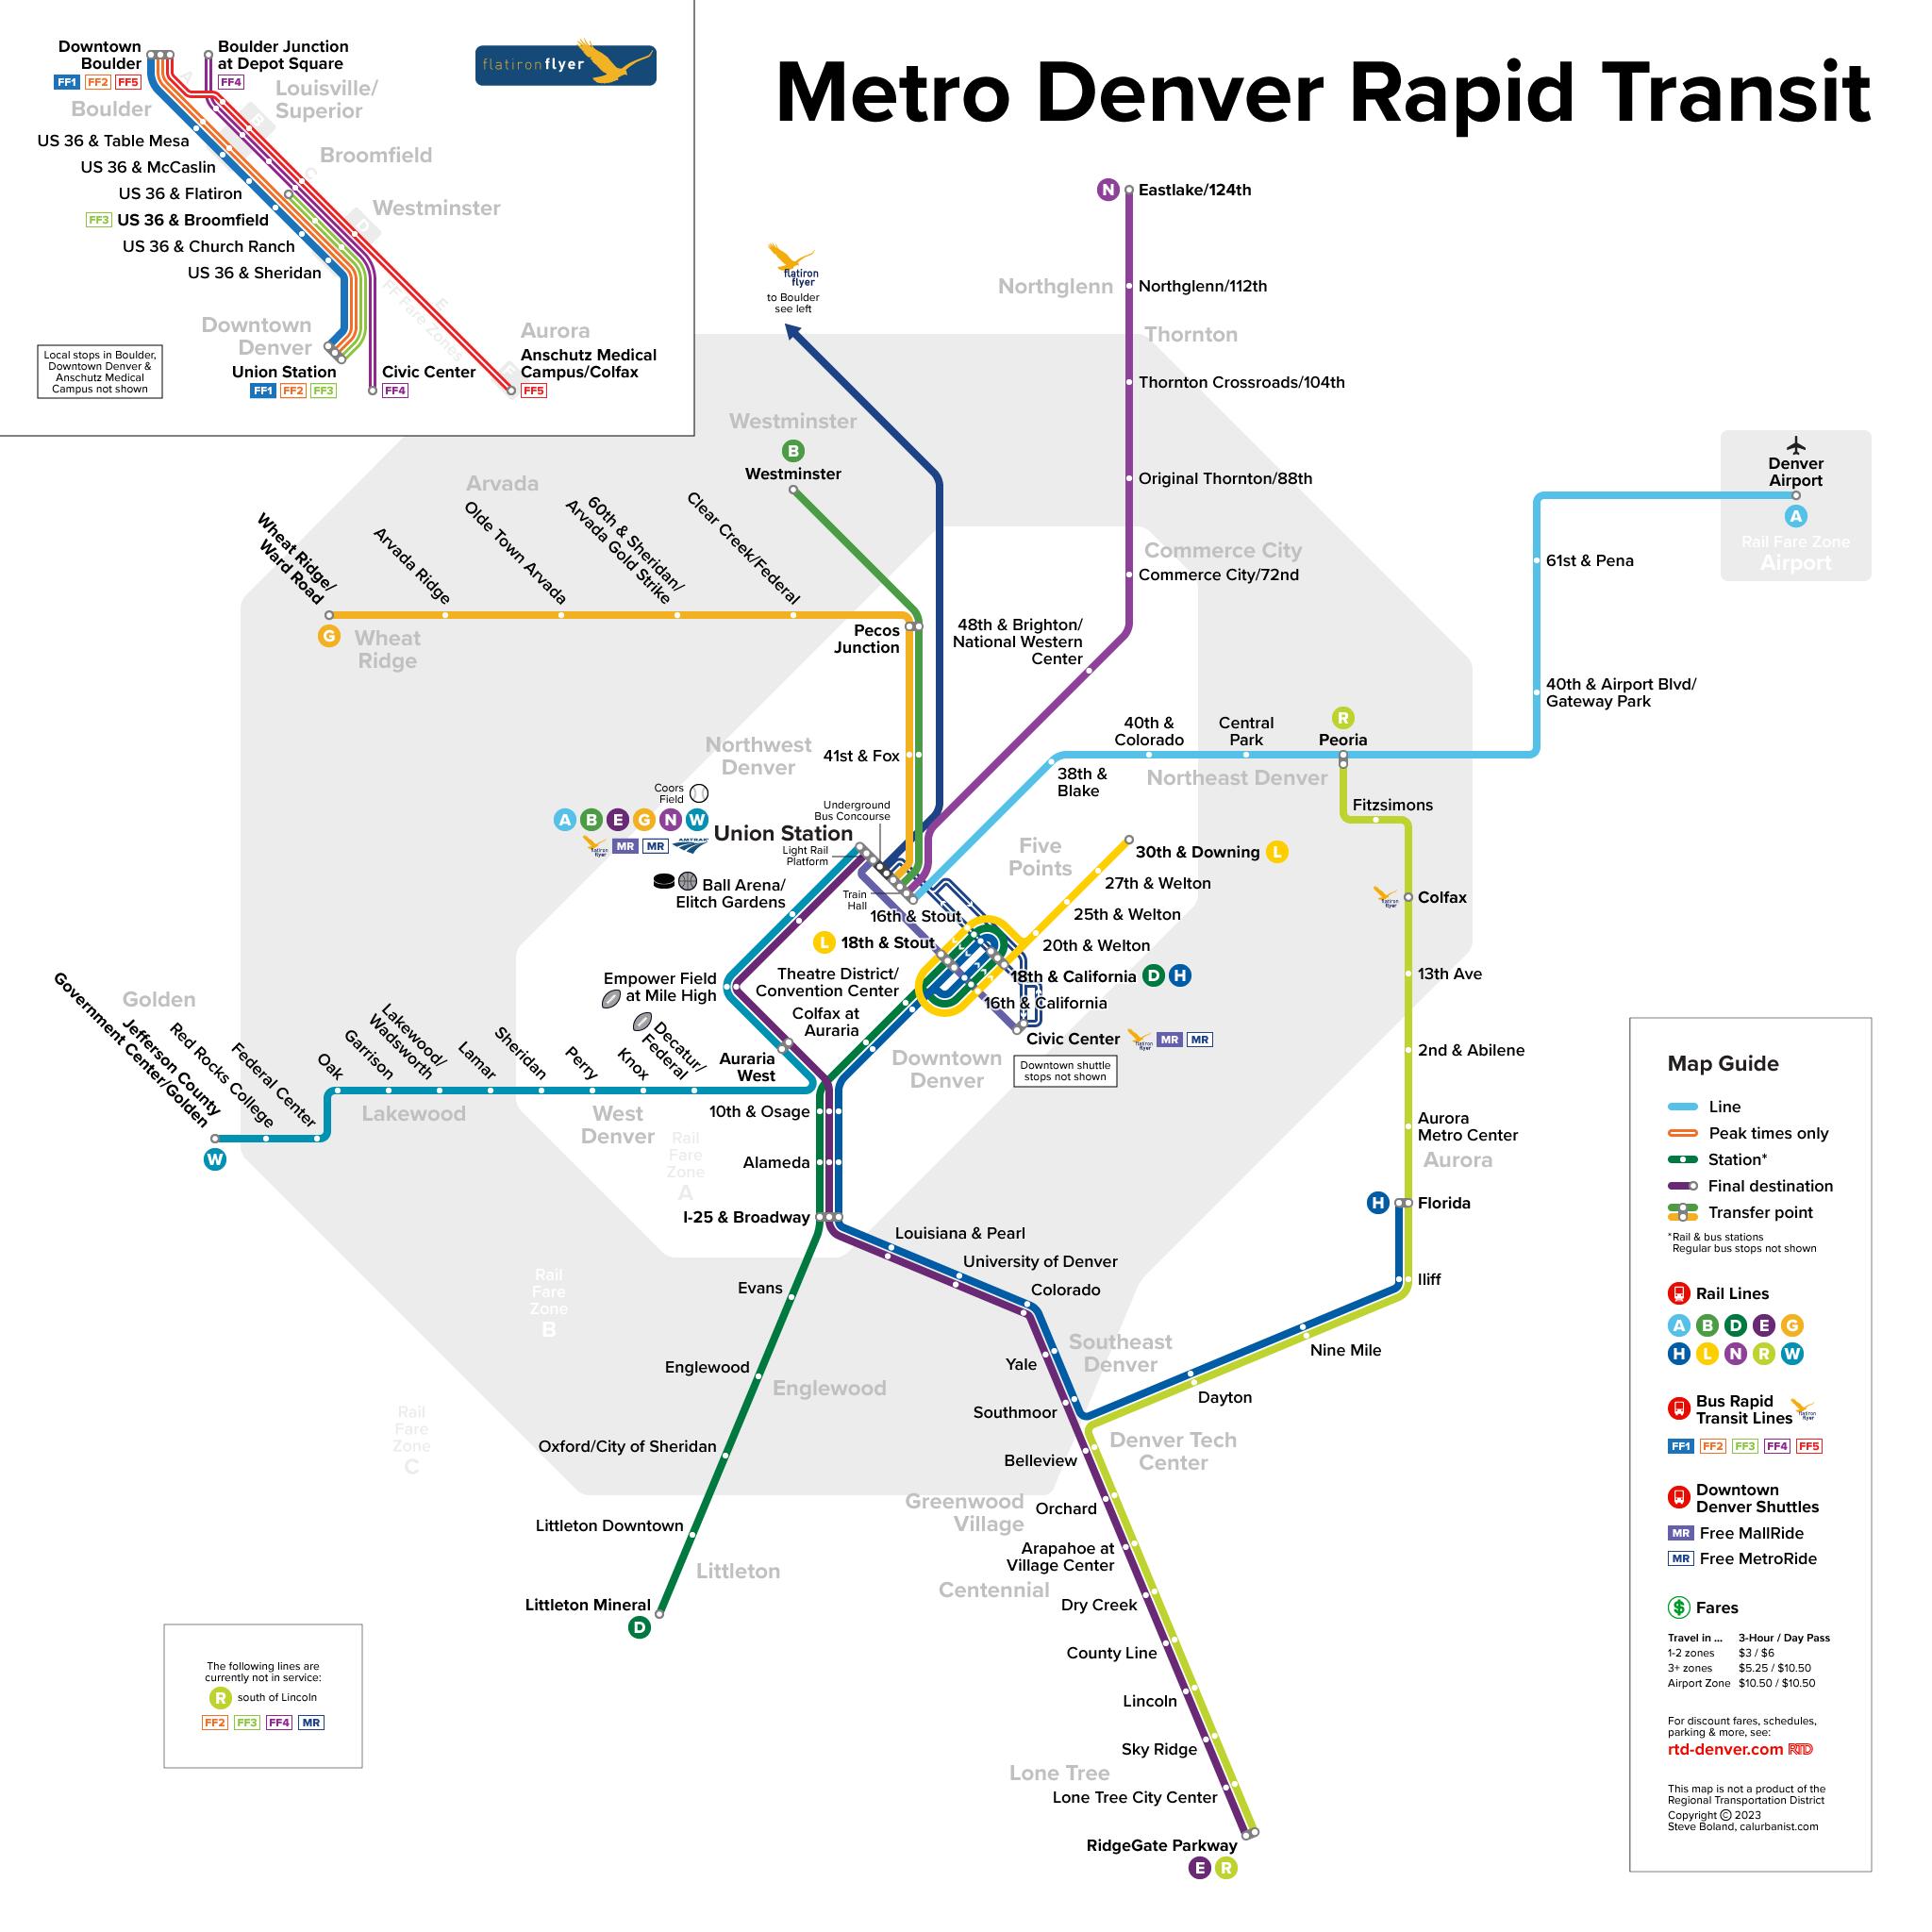 denver light rail map pdf Calurbanist Transit Maps Posters By Calurbanist denver light rail map pdf